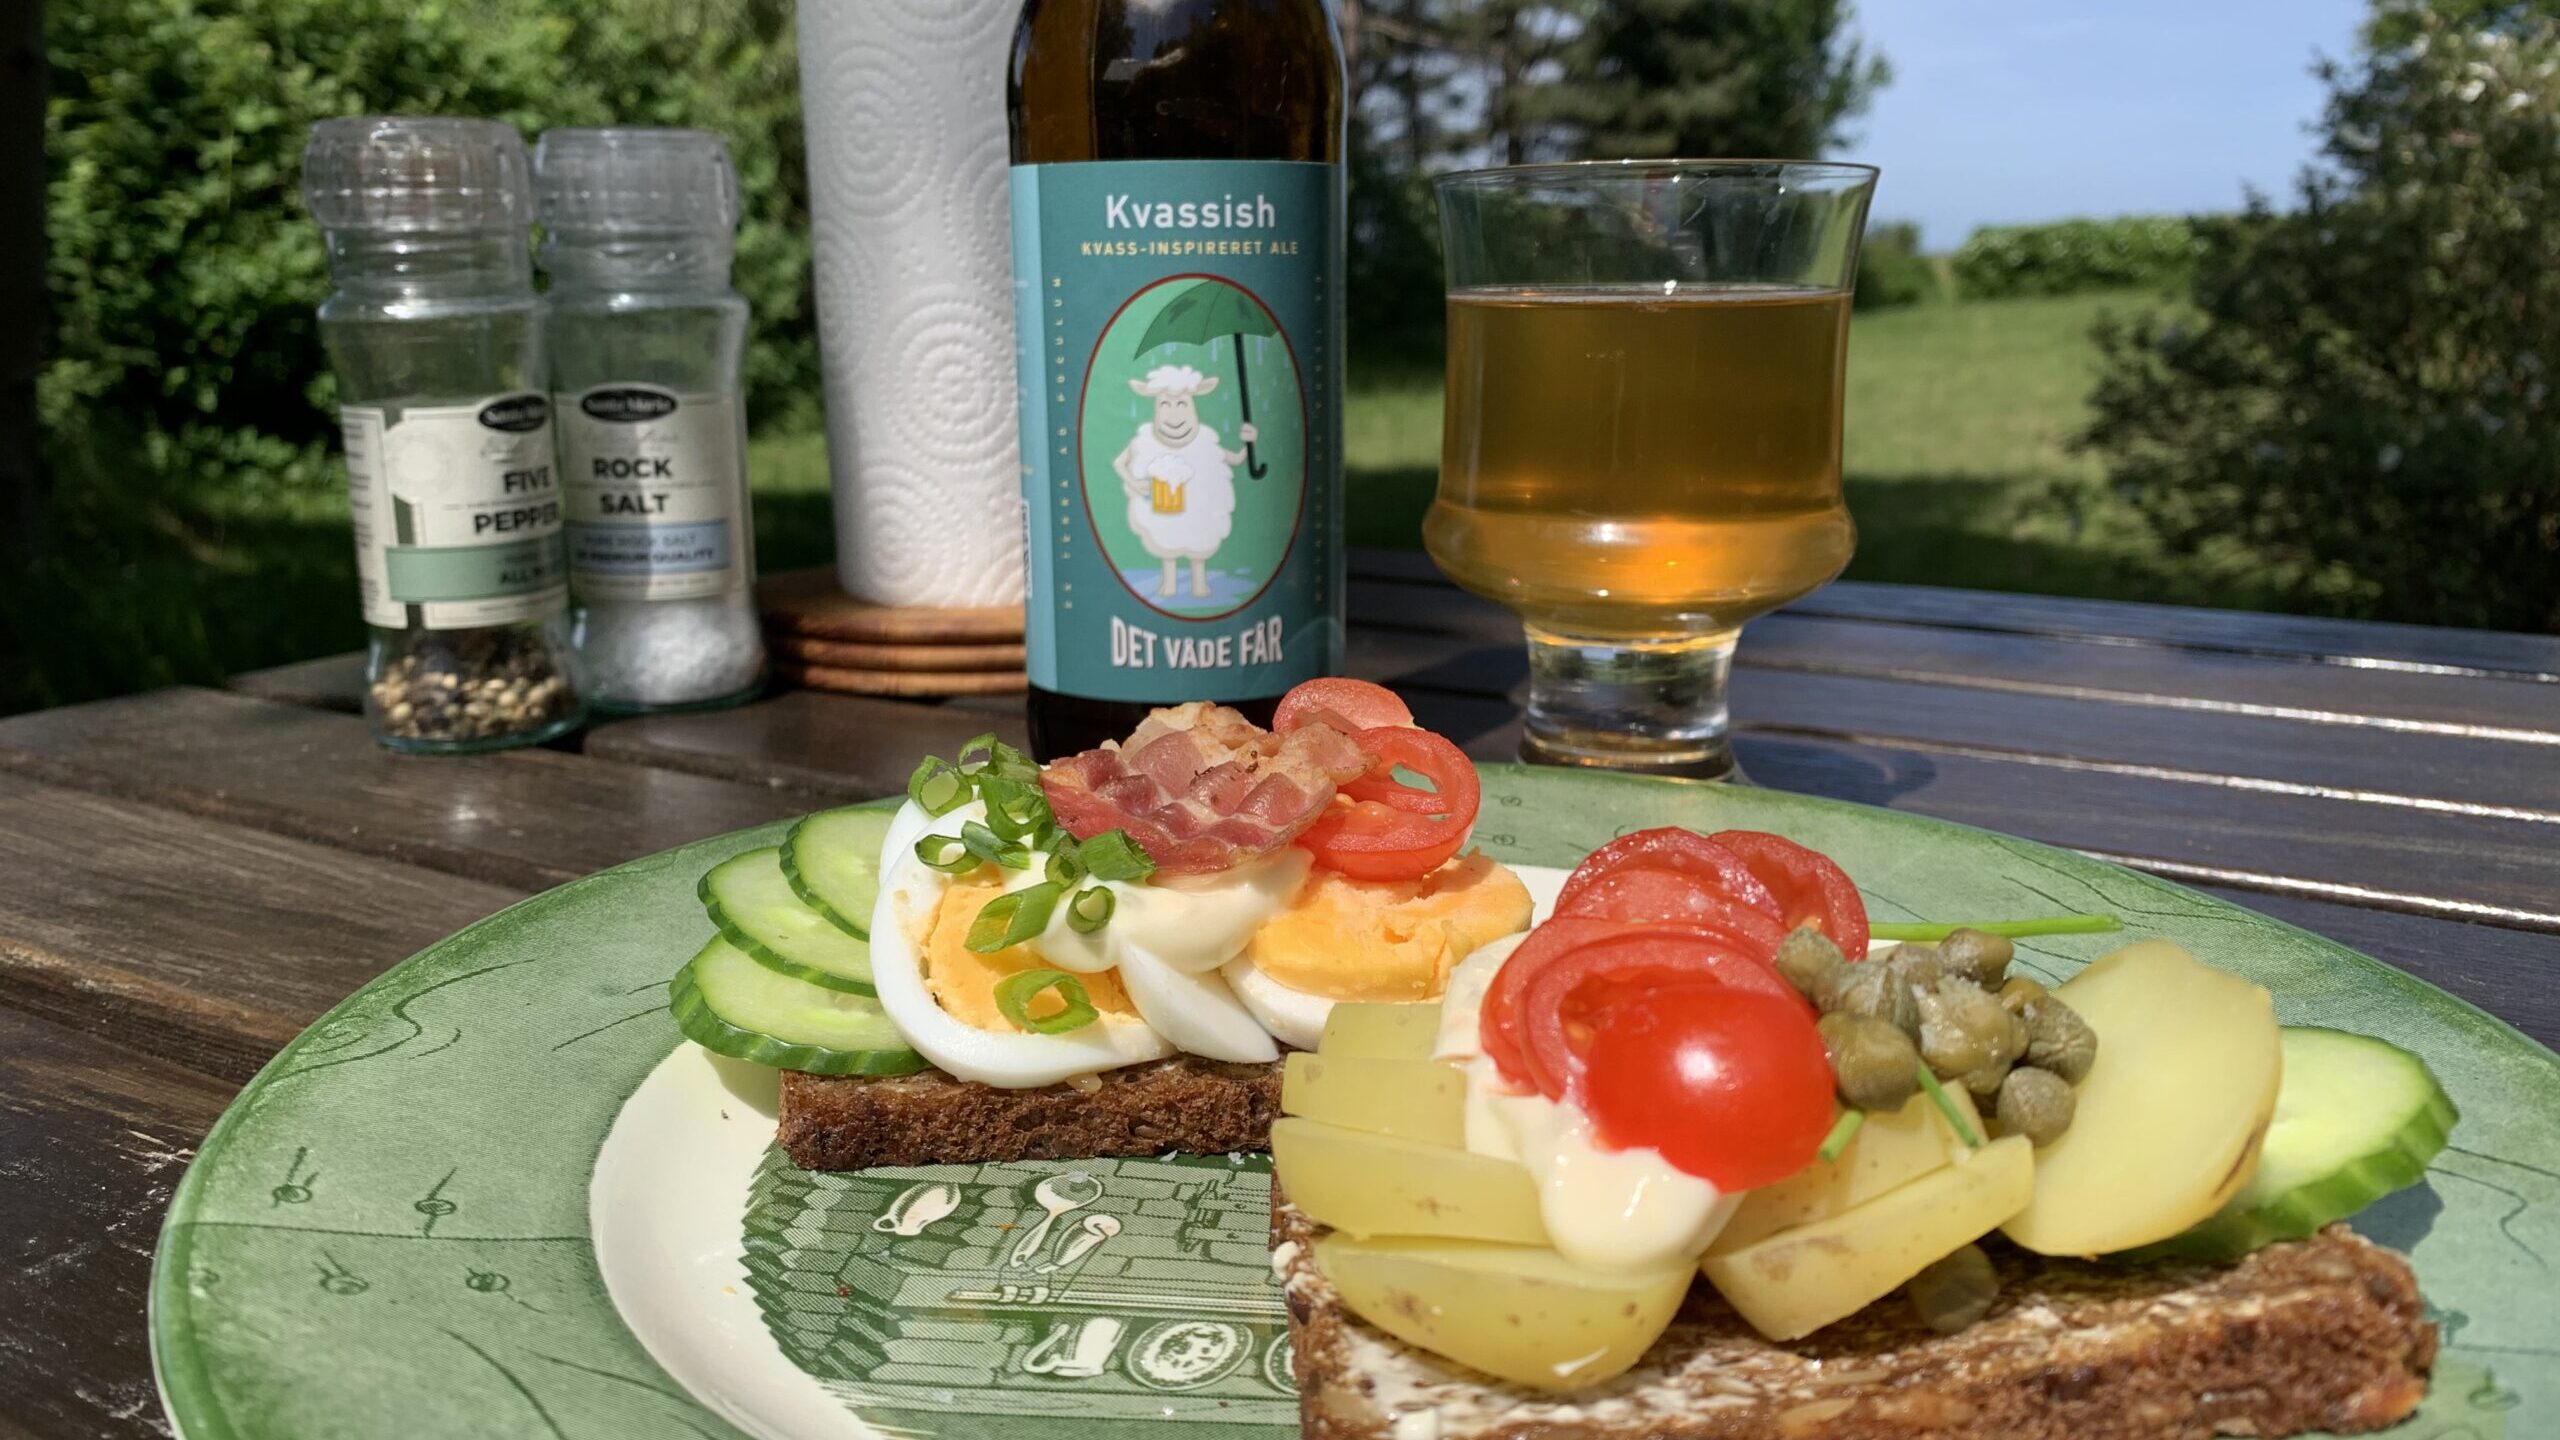 Madentusiasten: Sommersmørrebrød med en fyldig øl